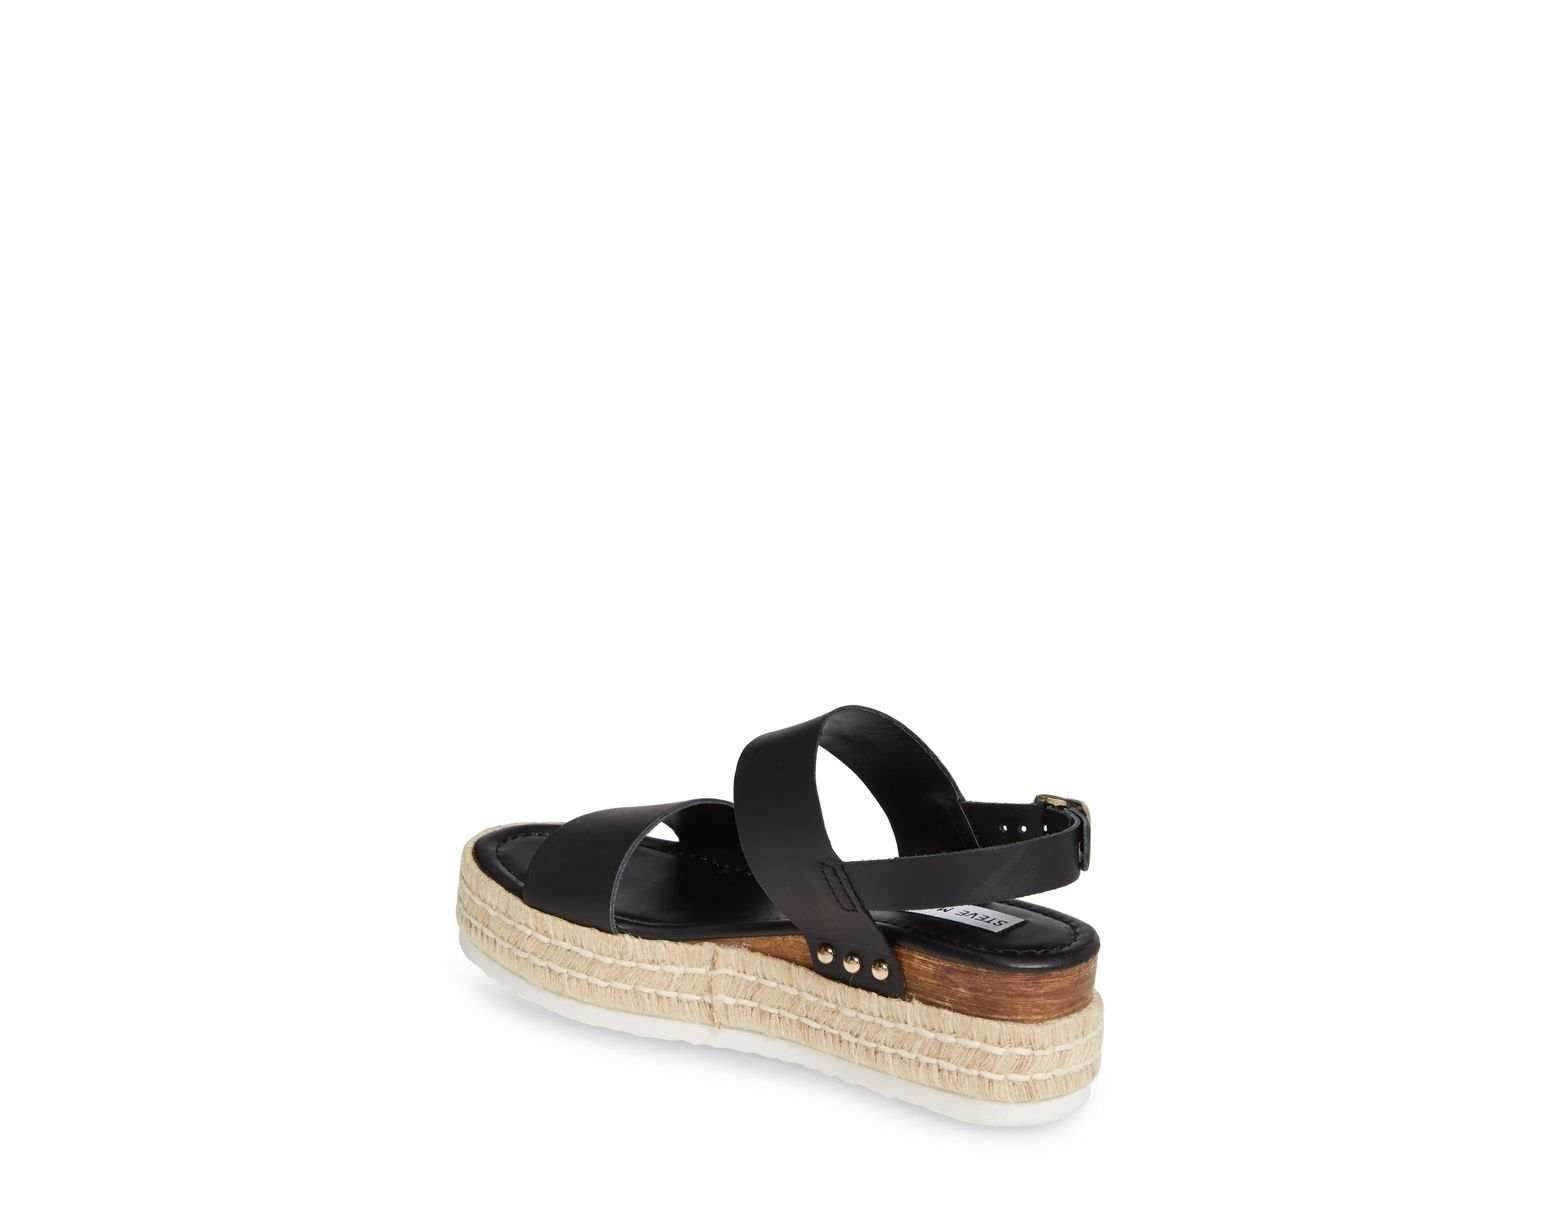 065923d997e Women's Black Catia Espadrille Wedge Sandal